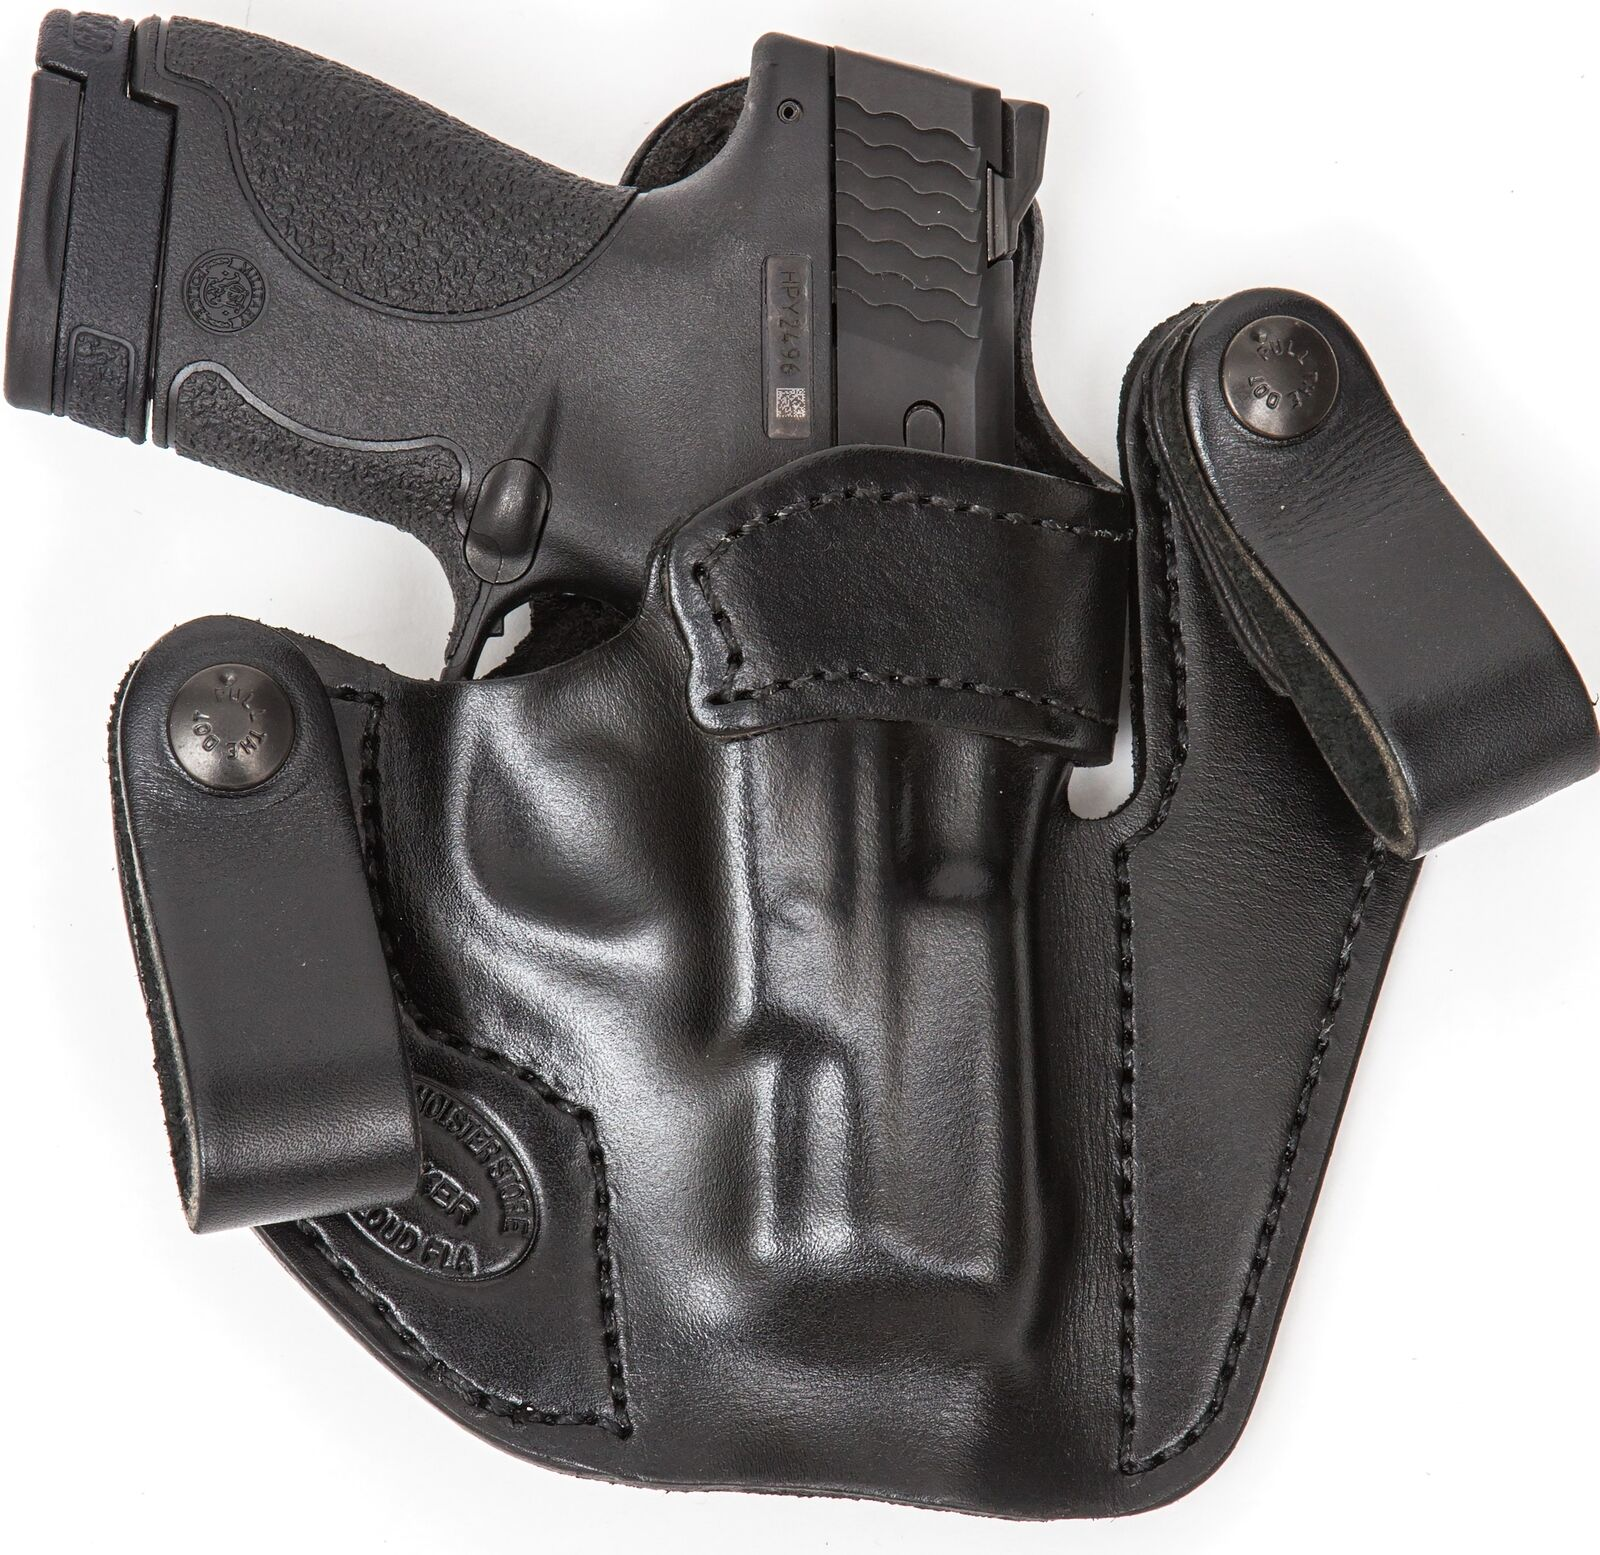 XTREME LH CARRY RH LH XTREME IWB Leder Gun Holster For Dan Wesson 1911 CCO 4.25 4aca49